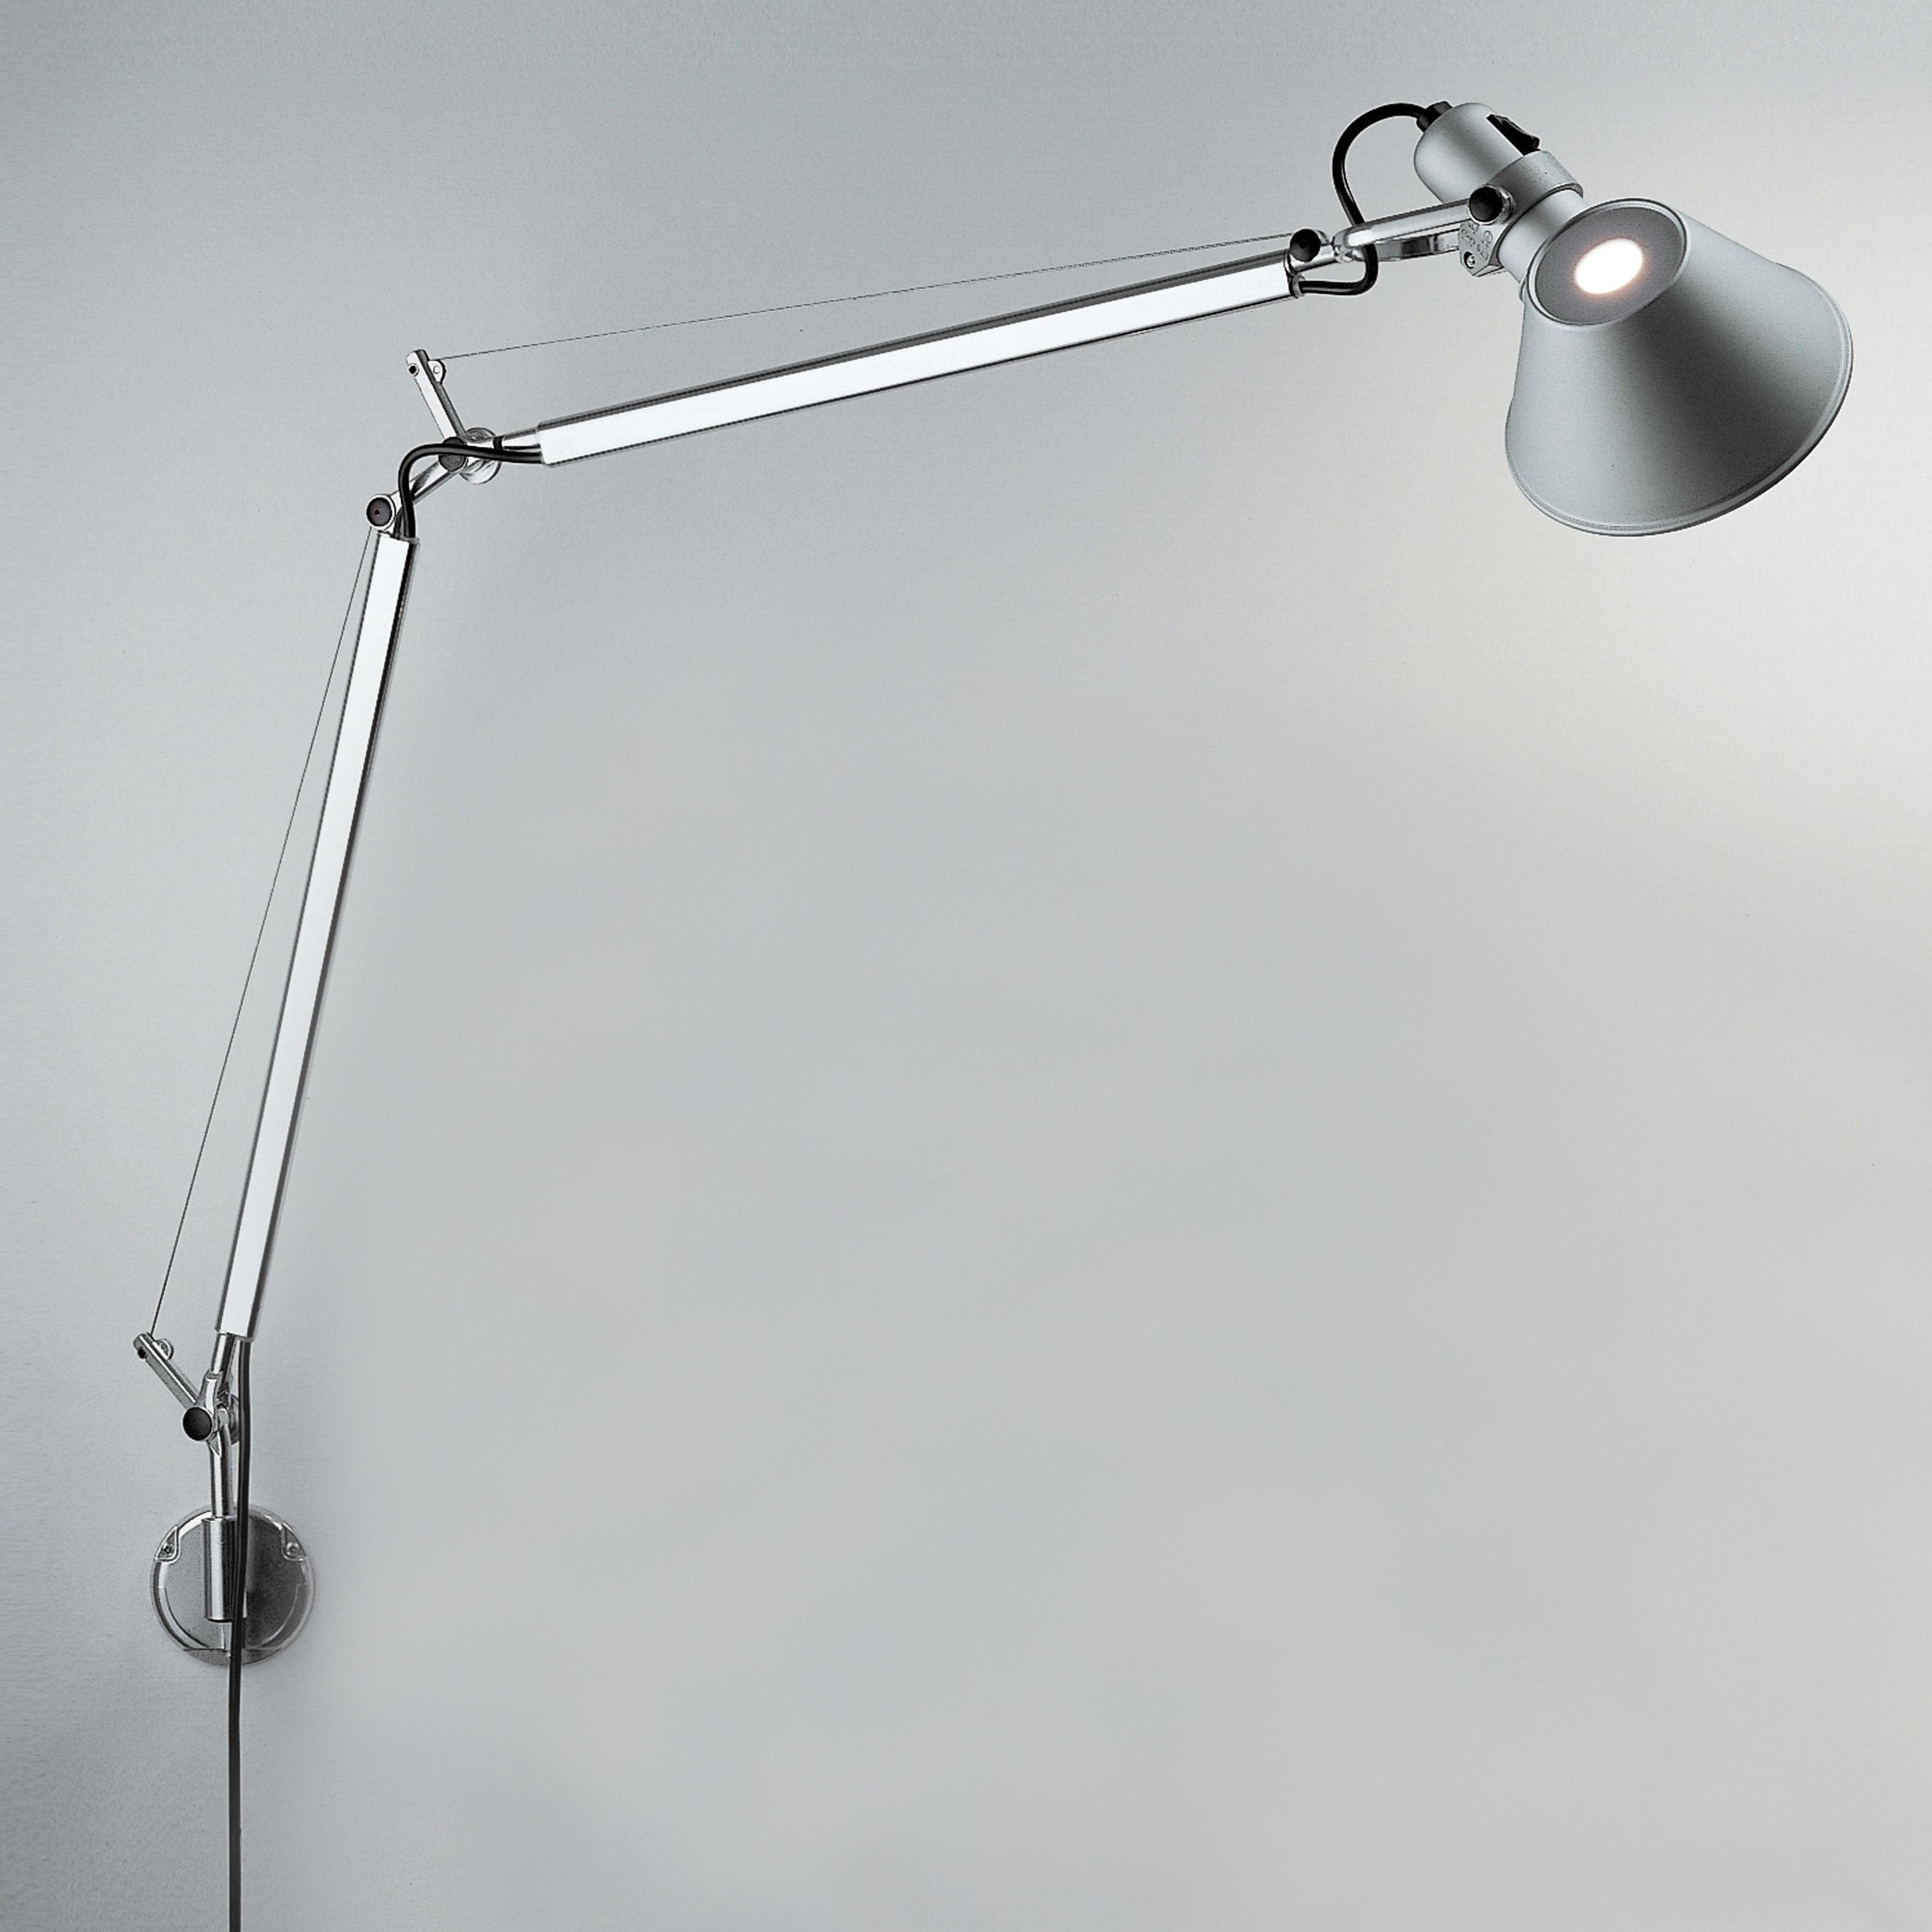 Luminaire - Appliques - Applique Tolomeo Wall LED / Bras articulé - L 81 cm - Artemide - L 81 cm / Aluminium - Aluminium